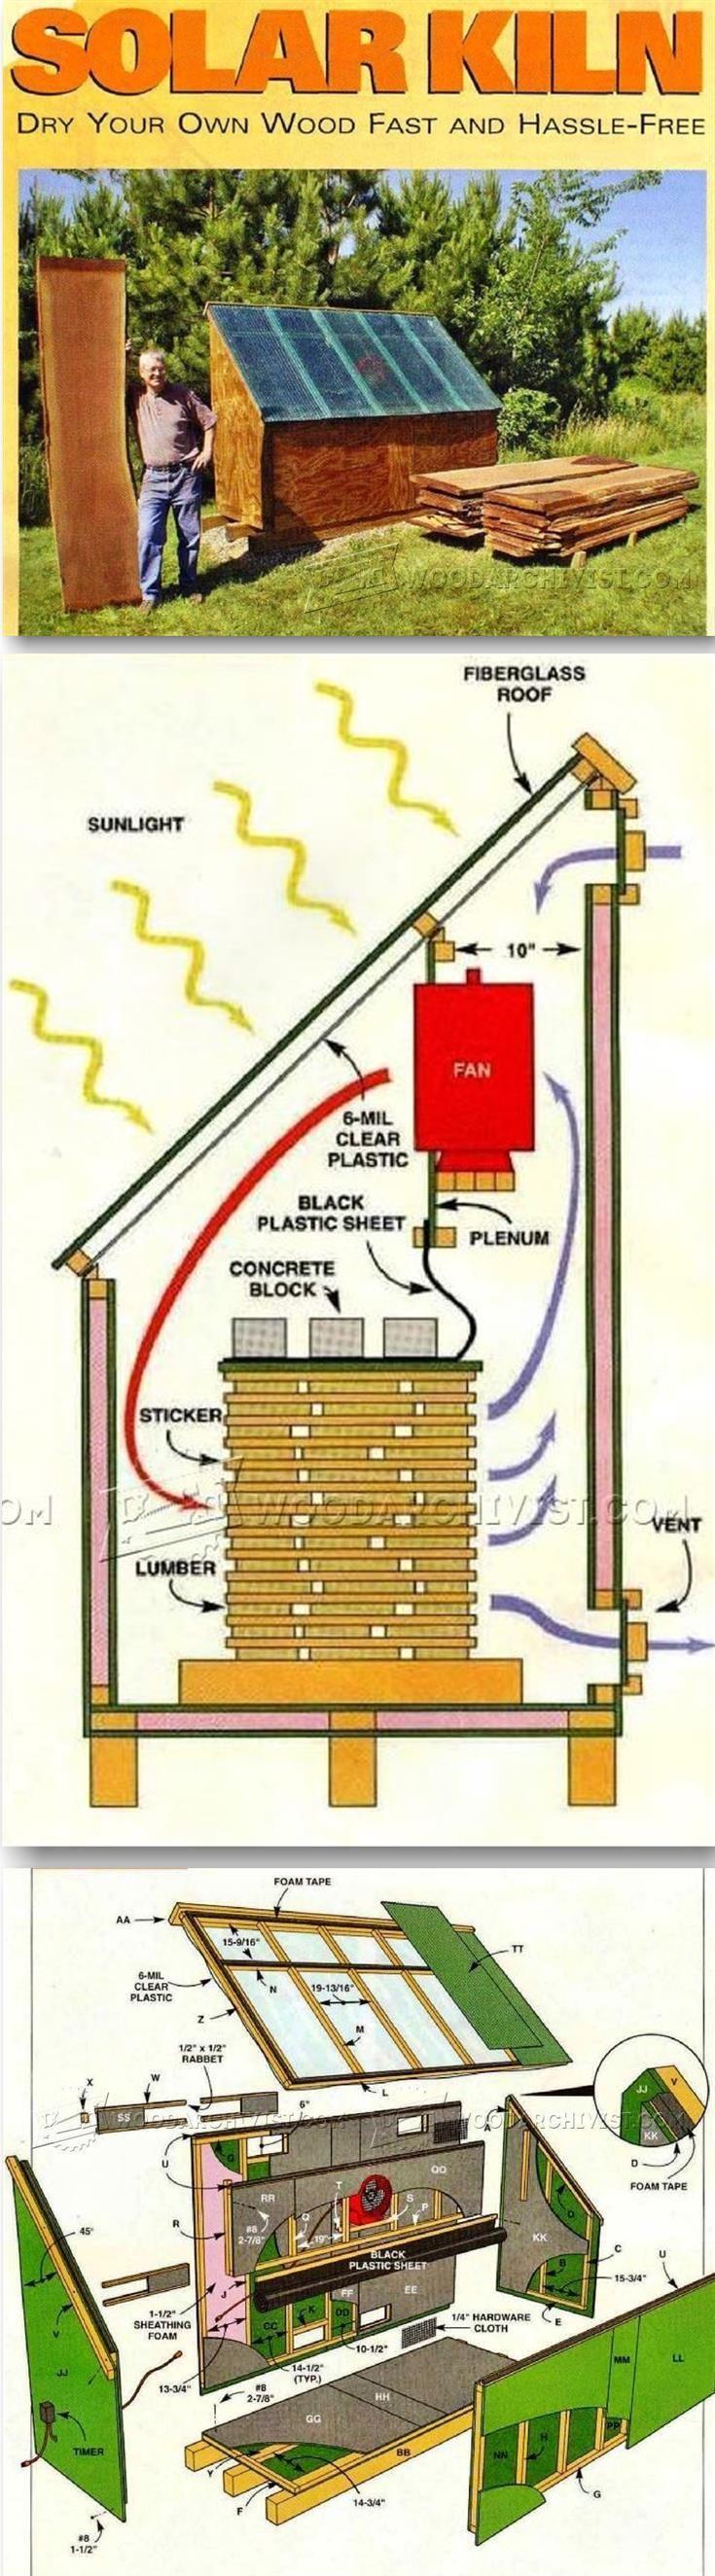 Solar Kiln Plans - Woodworking Tips and Techniques | WoodArchivist.com